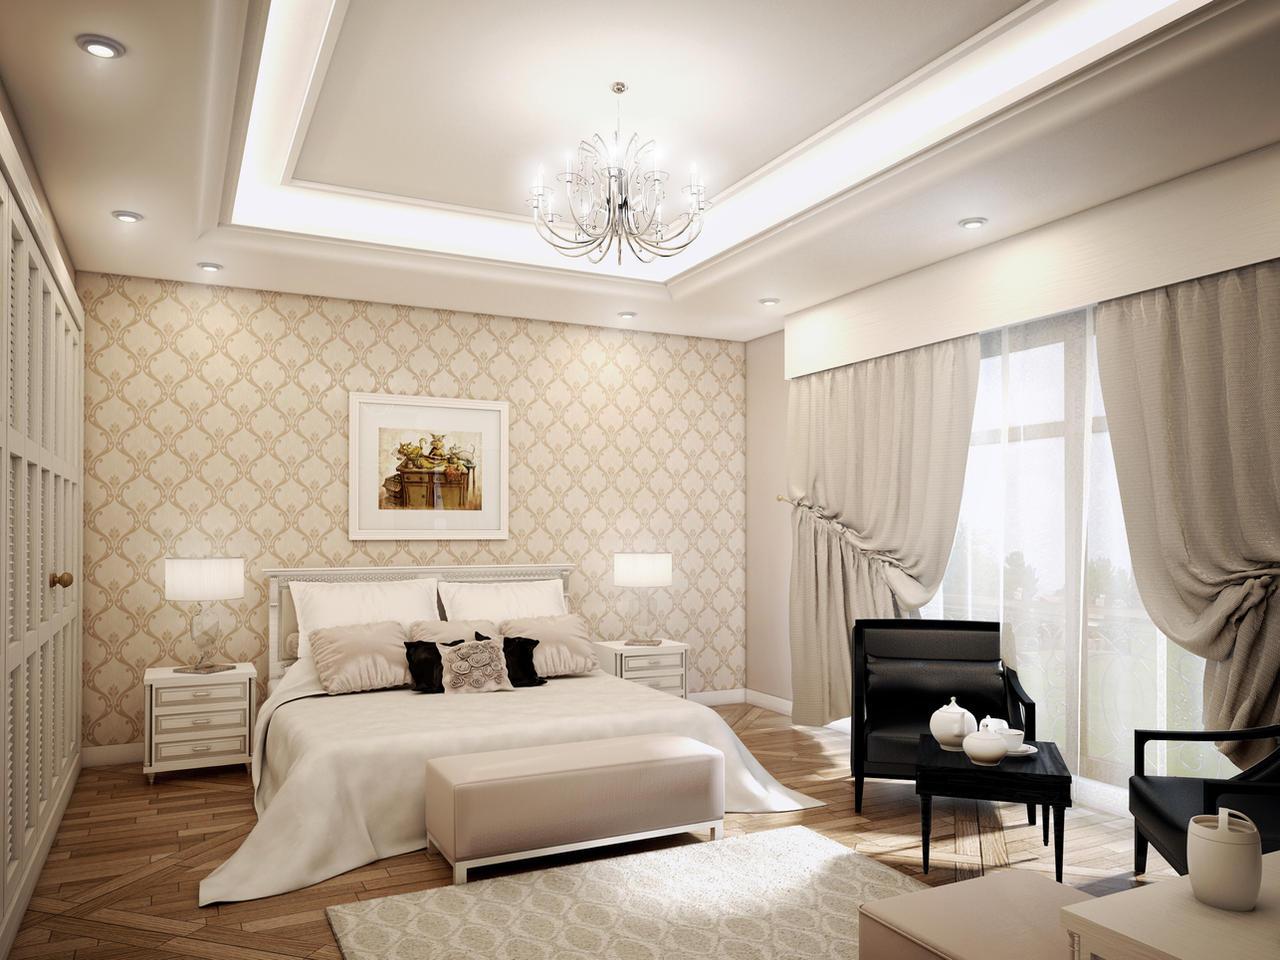 ... Teen Girl Classic Bedroom 2 By Kasrawy